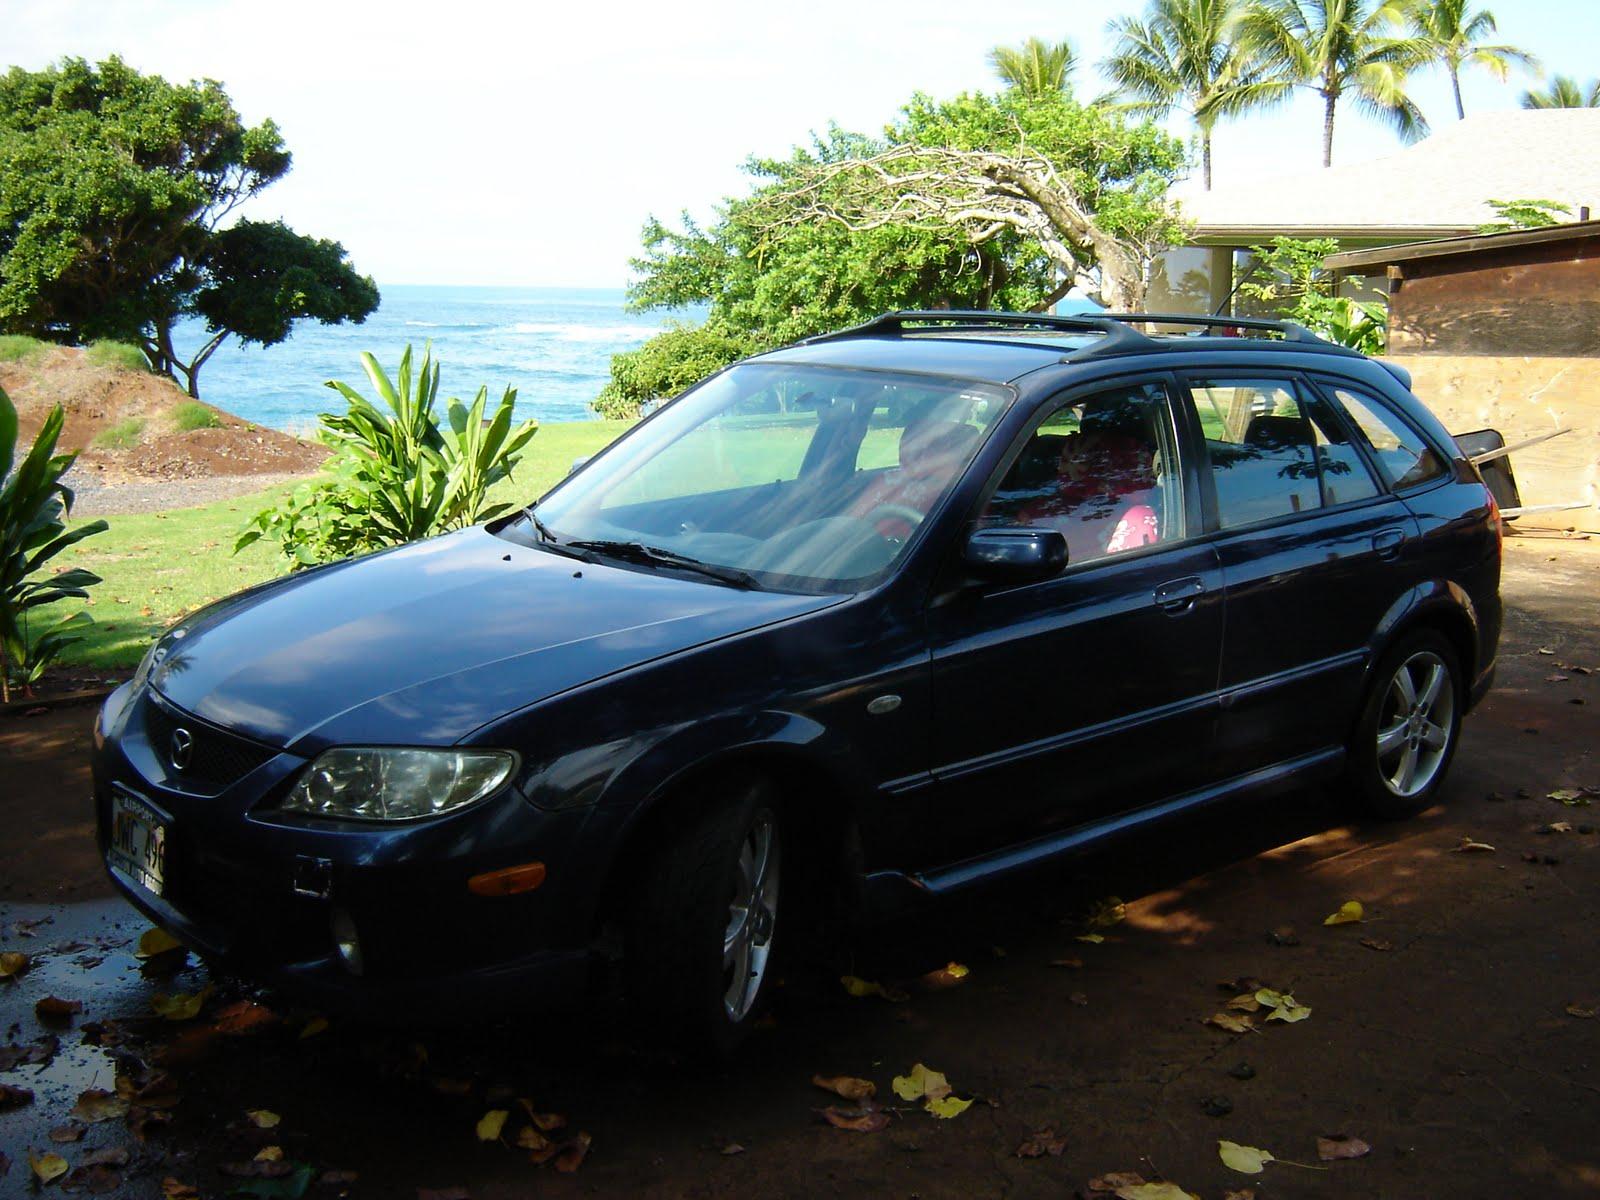 Maui Rental Cars Franks Friendly Car Llc Mazda 2002 Protege 5 Wagon Protege5 Sport